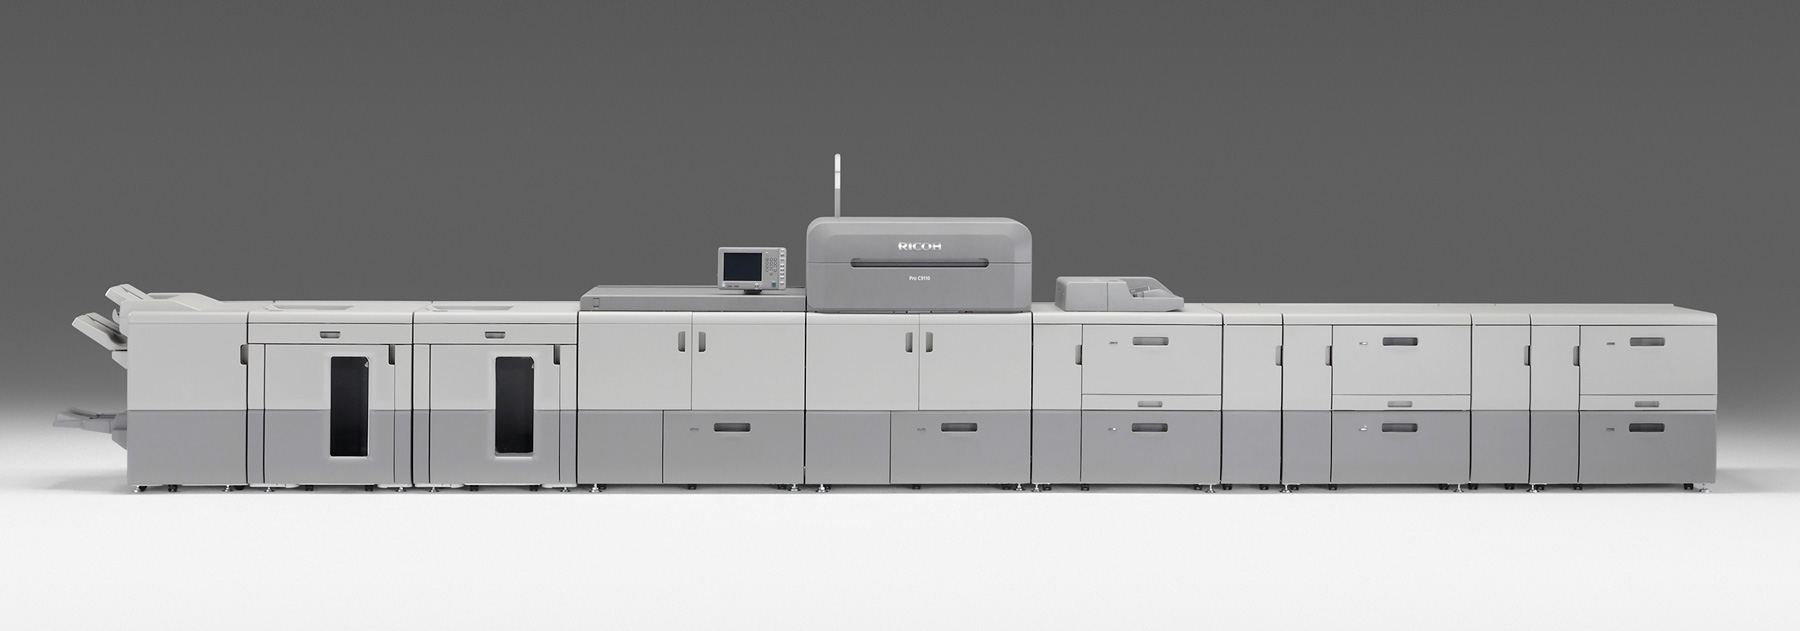 Impresoras de alta produccion